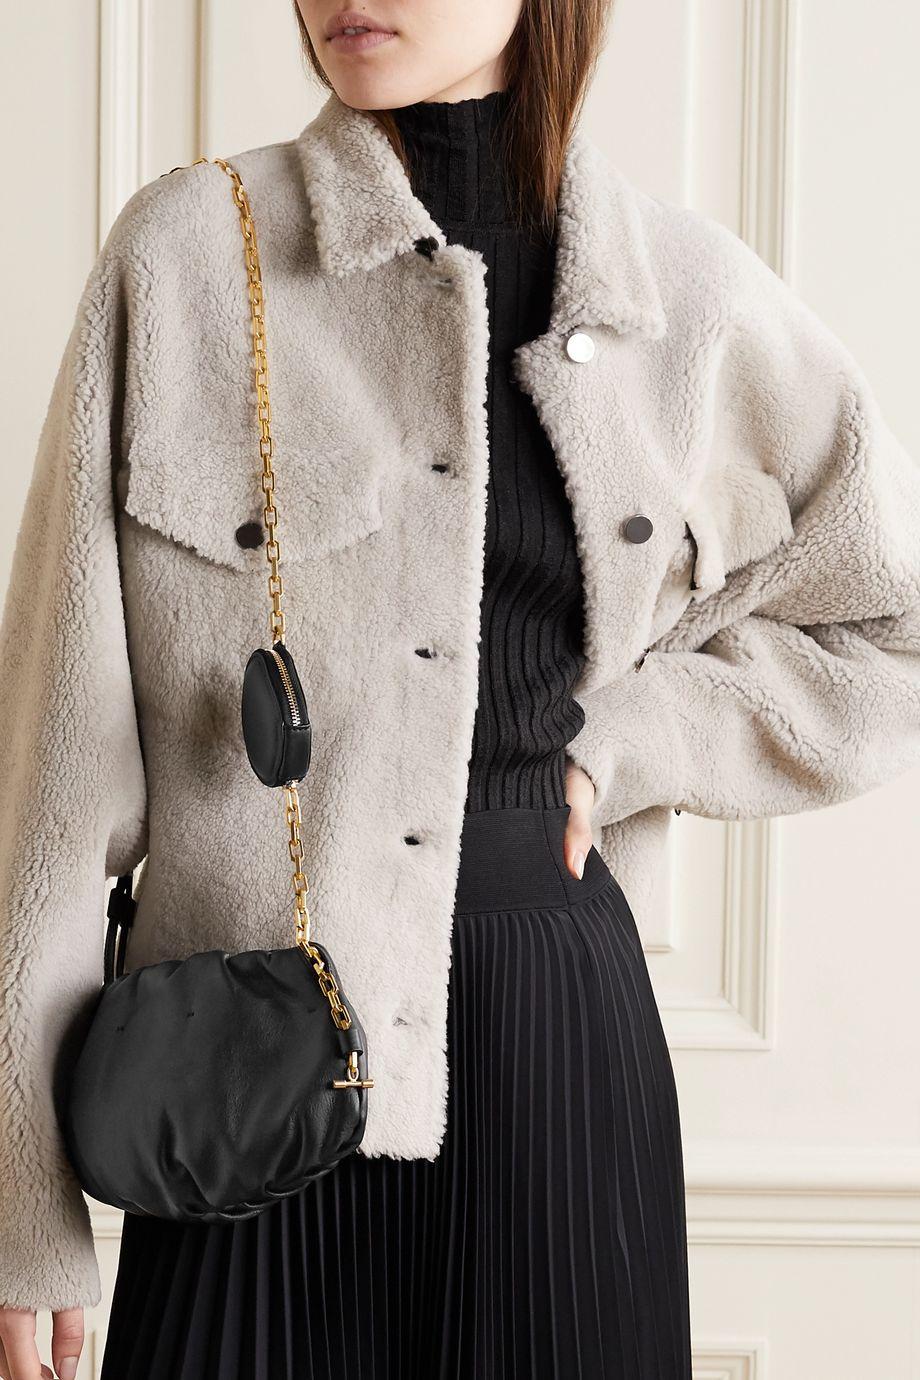 THE VOLON Gabi leather shoulder bag